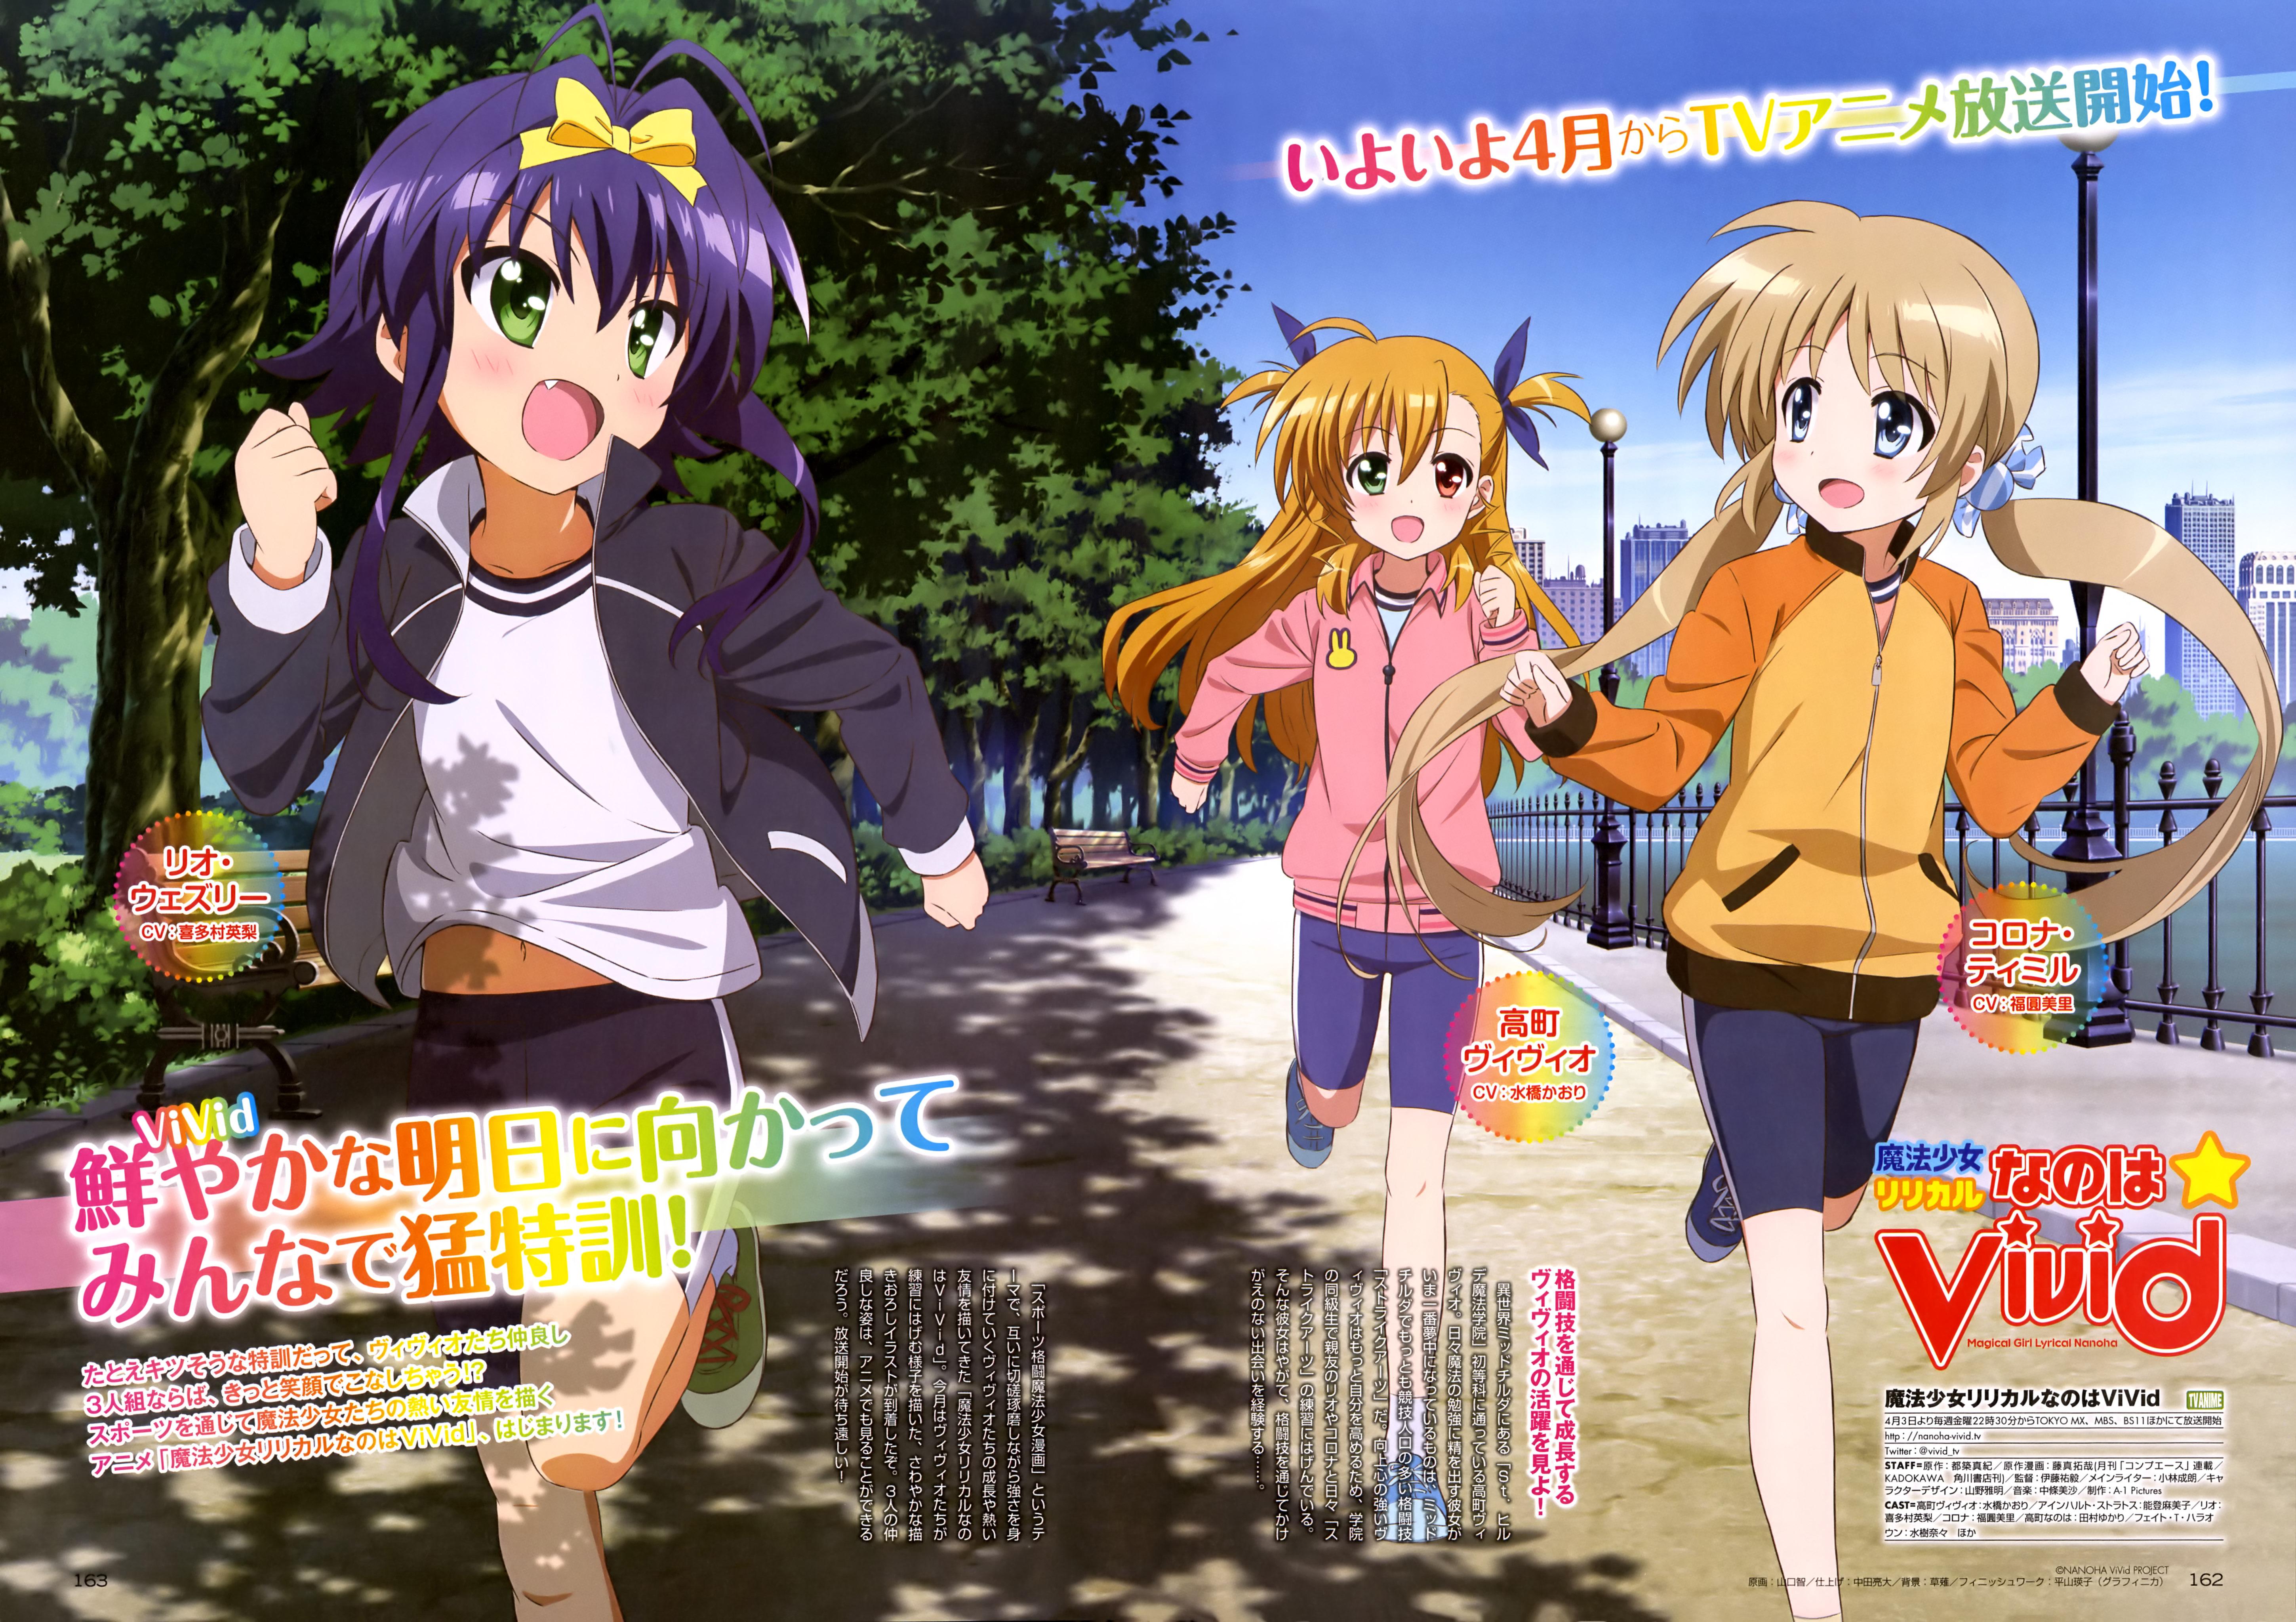 Mahou Shoujo Lyrical Nanoha ViVid Anime Magazine Visual